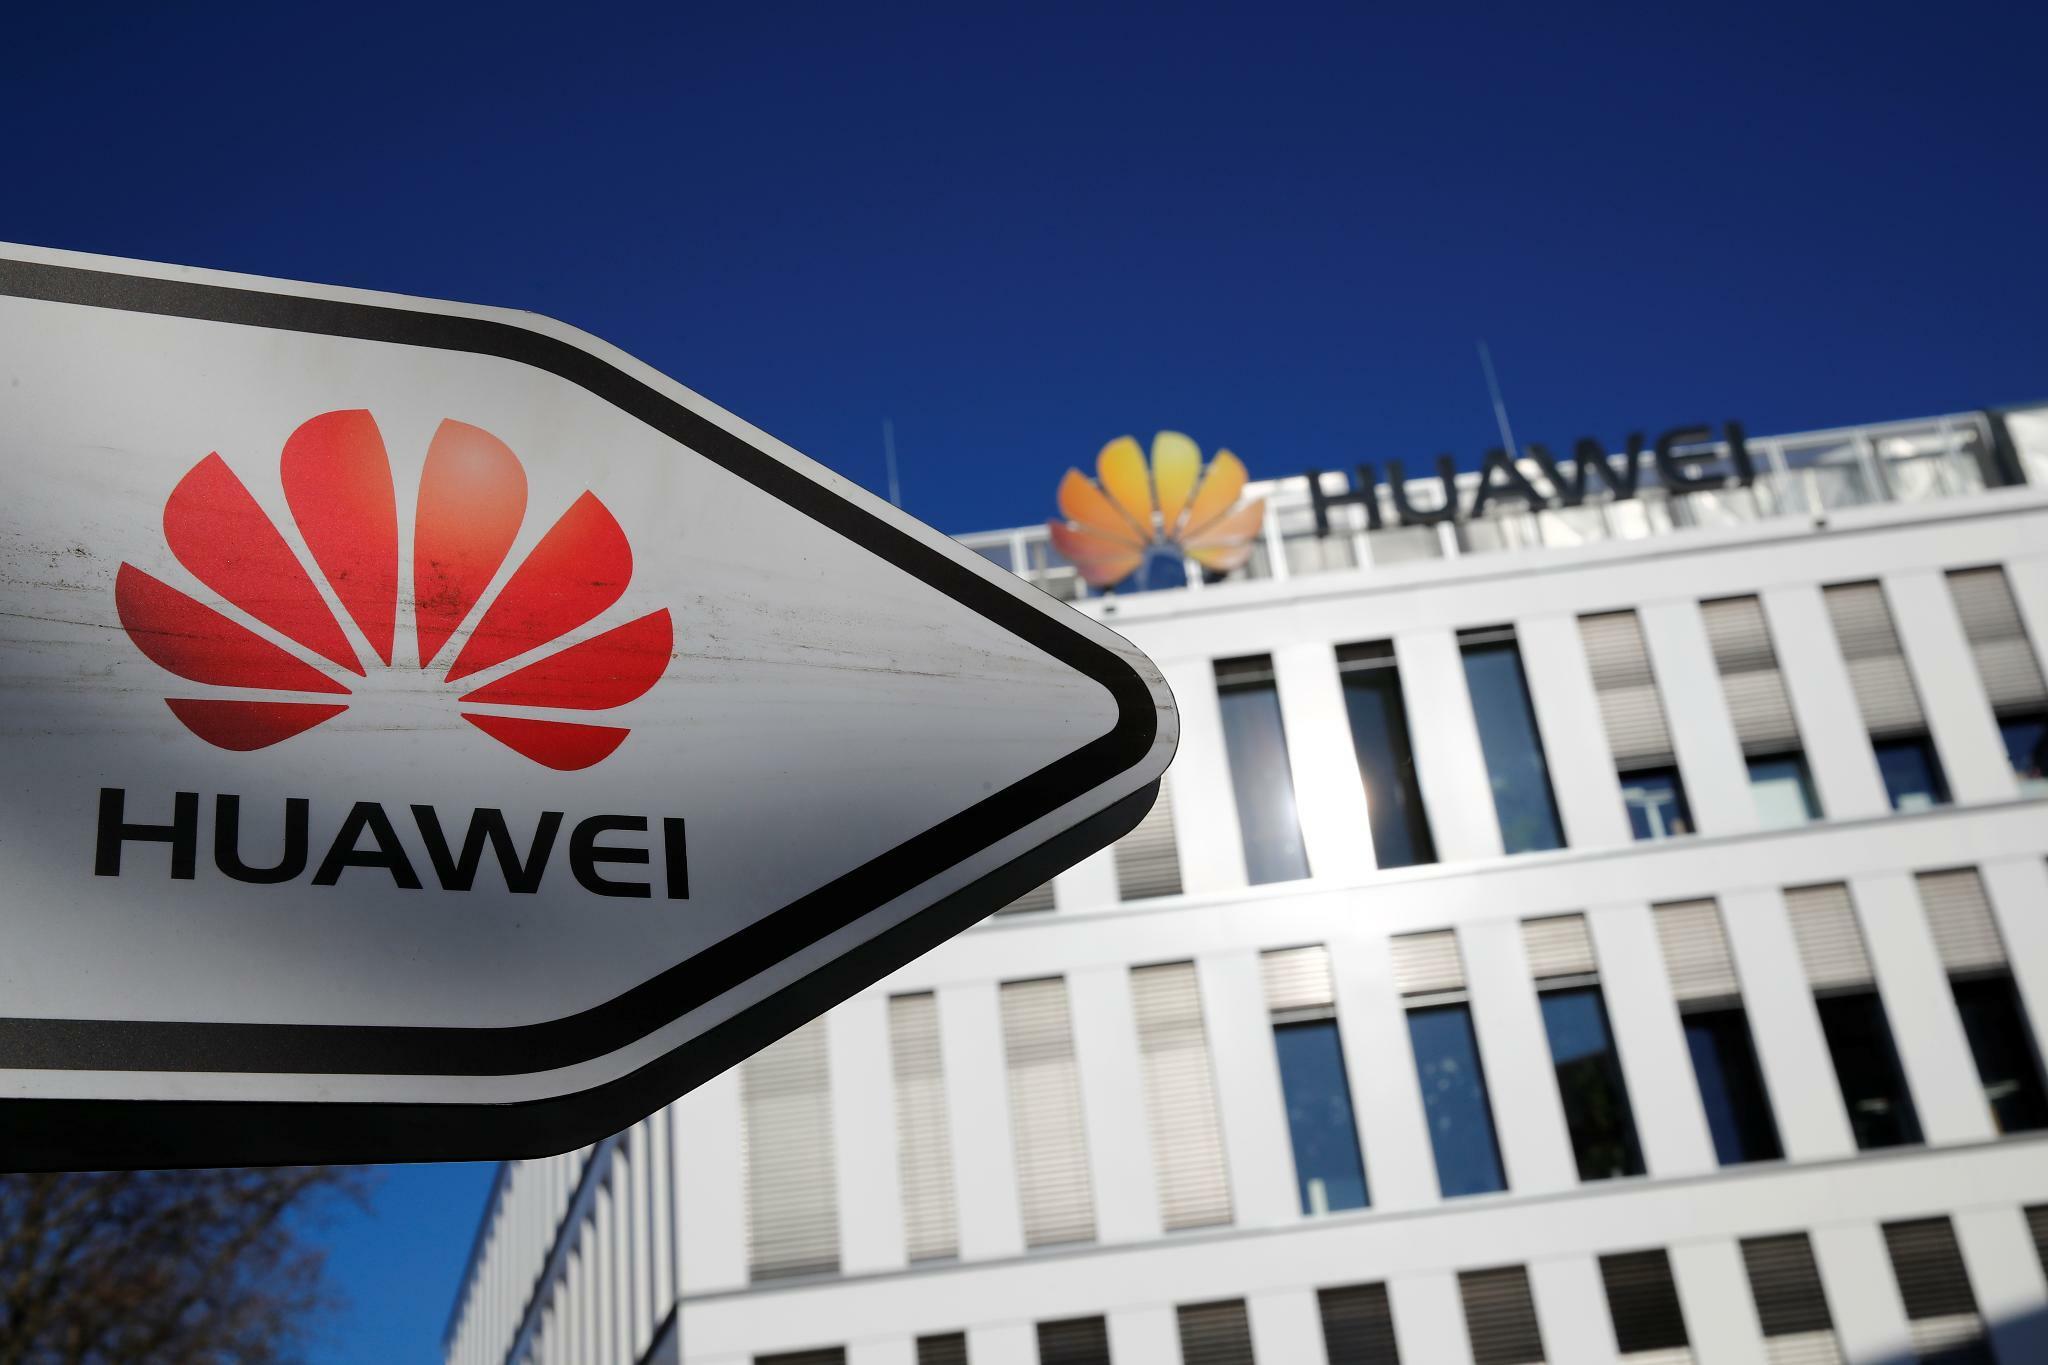 5G-Netzausbau: Merkel interveniert im Huawei-Streit